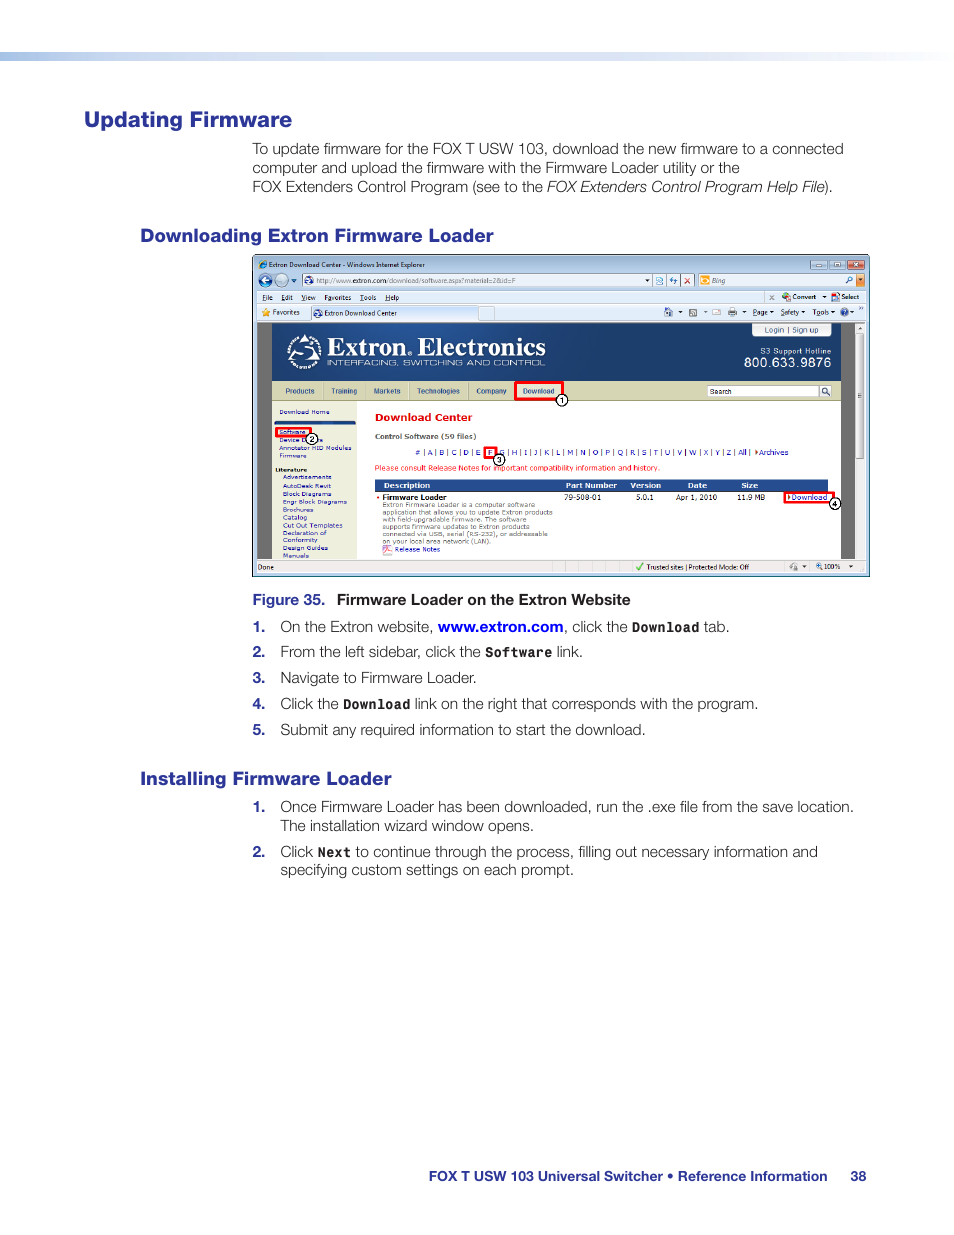 Updating firmware, Downloading extron firmware loader, Installing